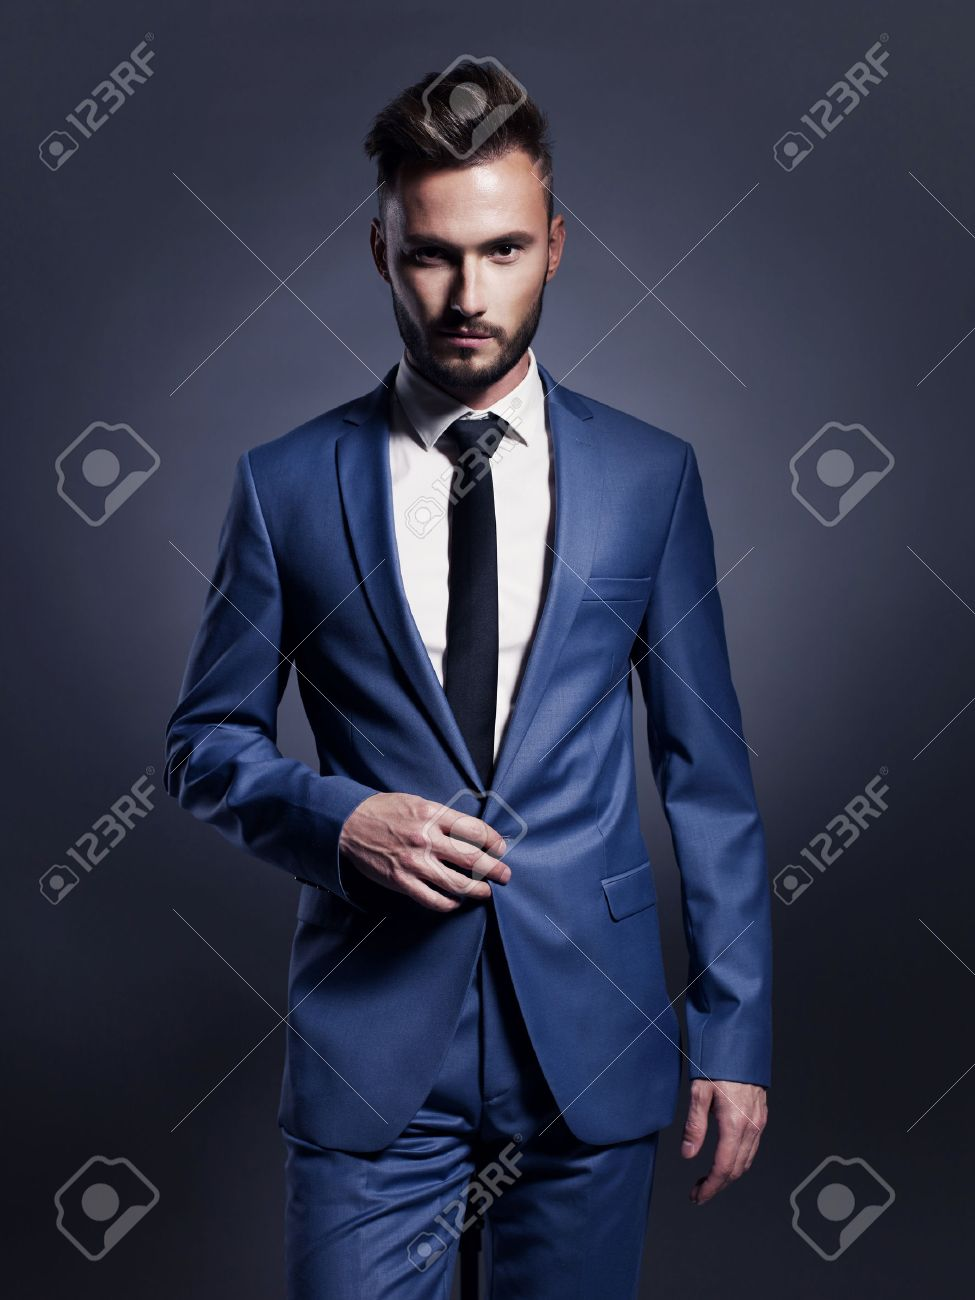 Portrait of handsome stylish man in elegant blue suit Standard-Bild - 46647180